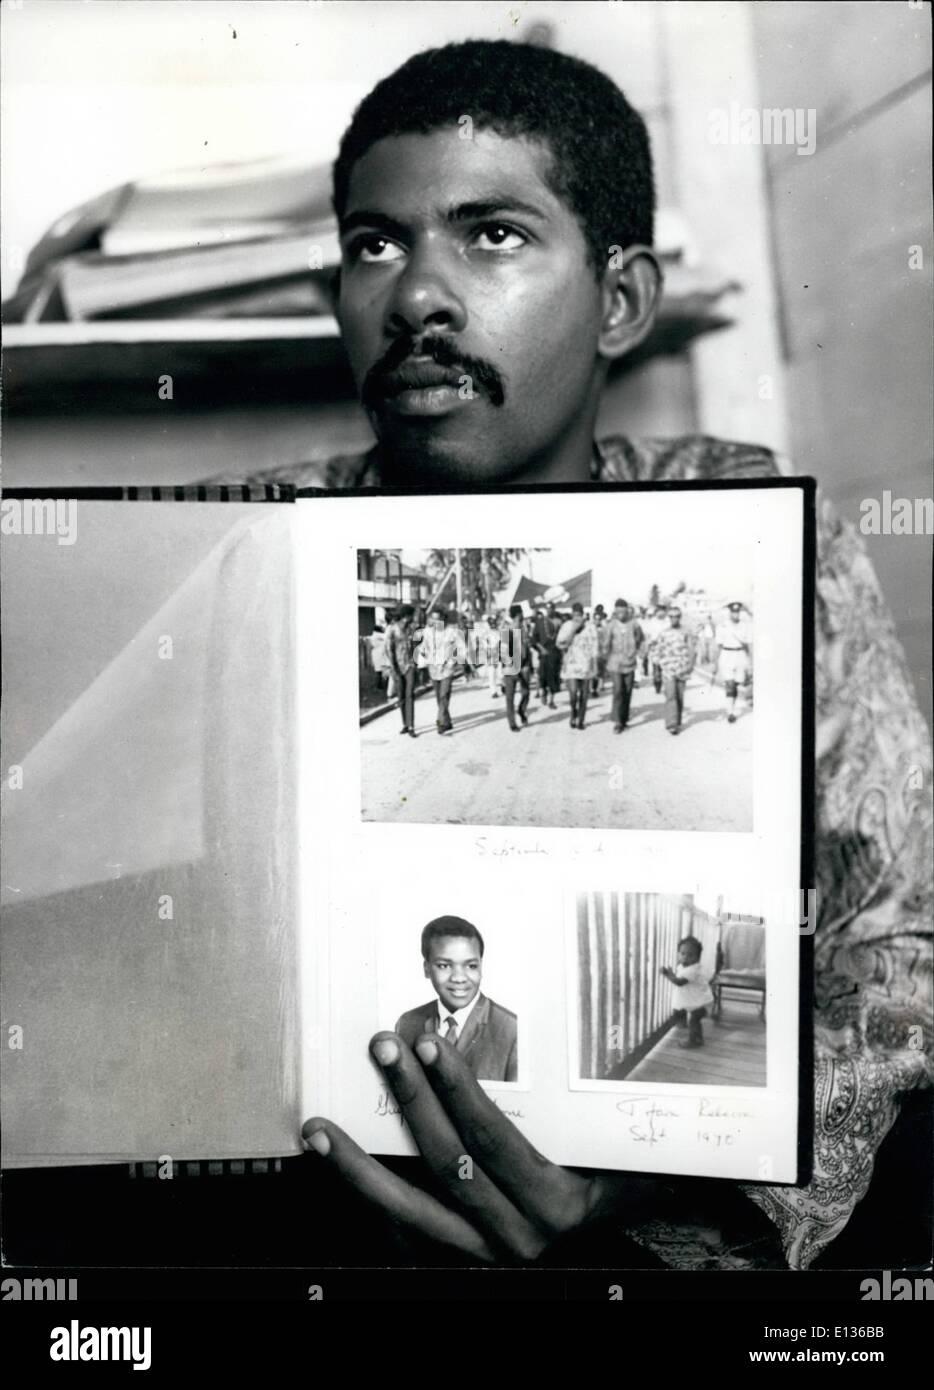 Feb. 28, 2012 - Evan X Hyde, a popular man in British Hondures, heeds UBAD, the black power party. - Stock Image